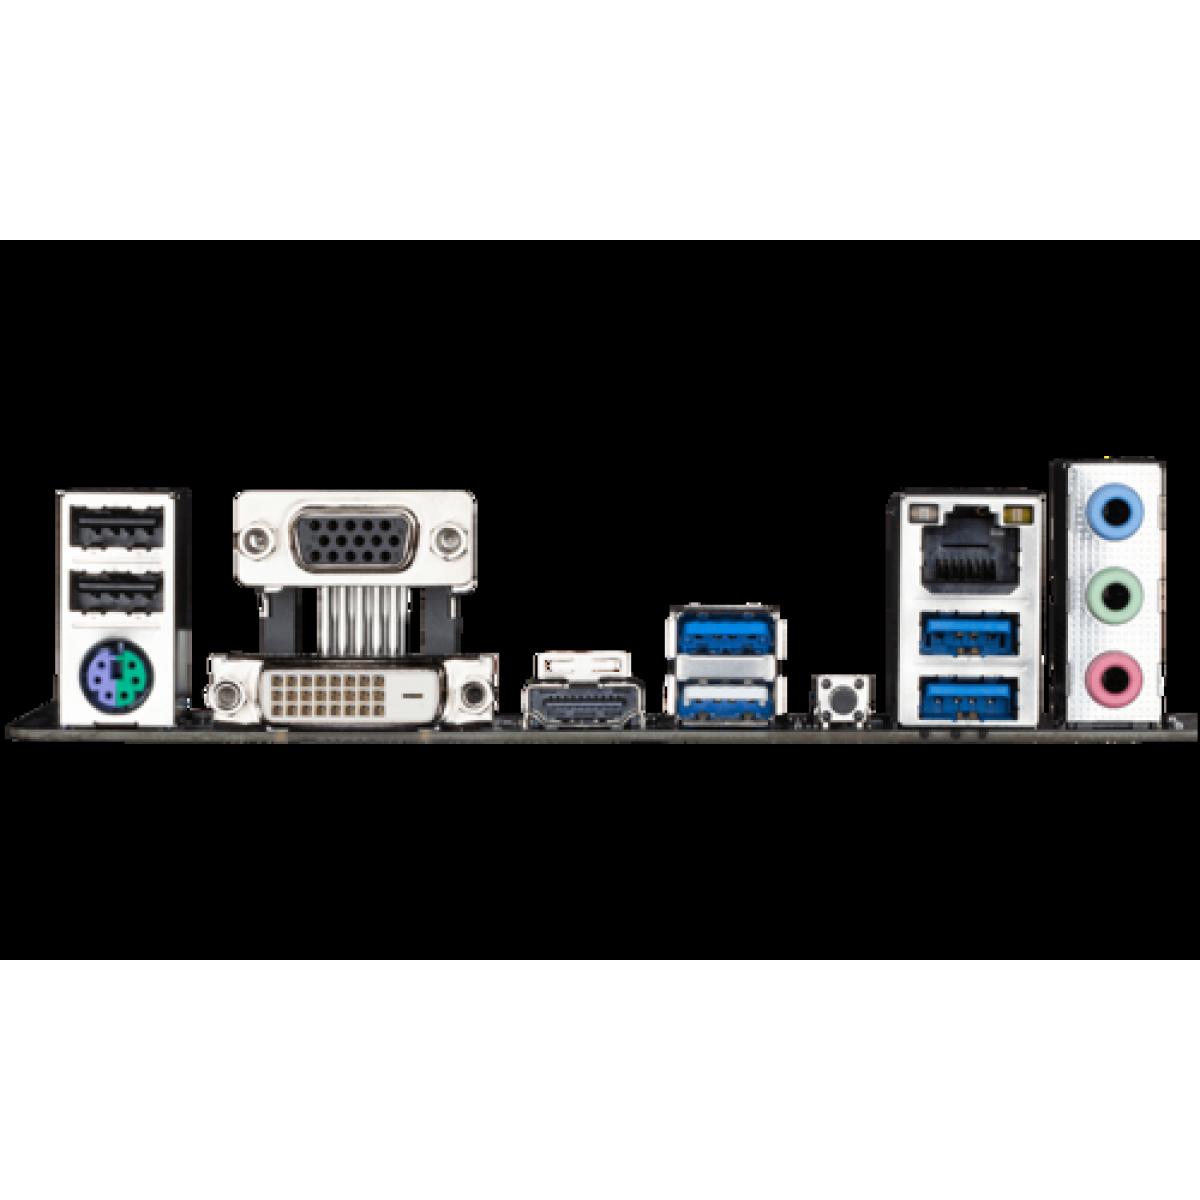 Placa Mãe Gigabyte B550M Gaming, Chipset B550, AMD AM4, mATX, DDR4